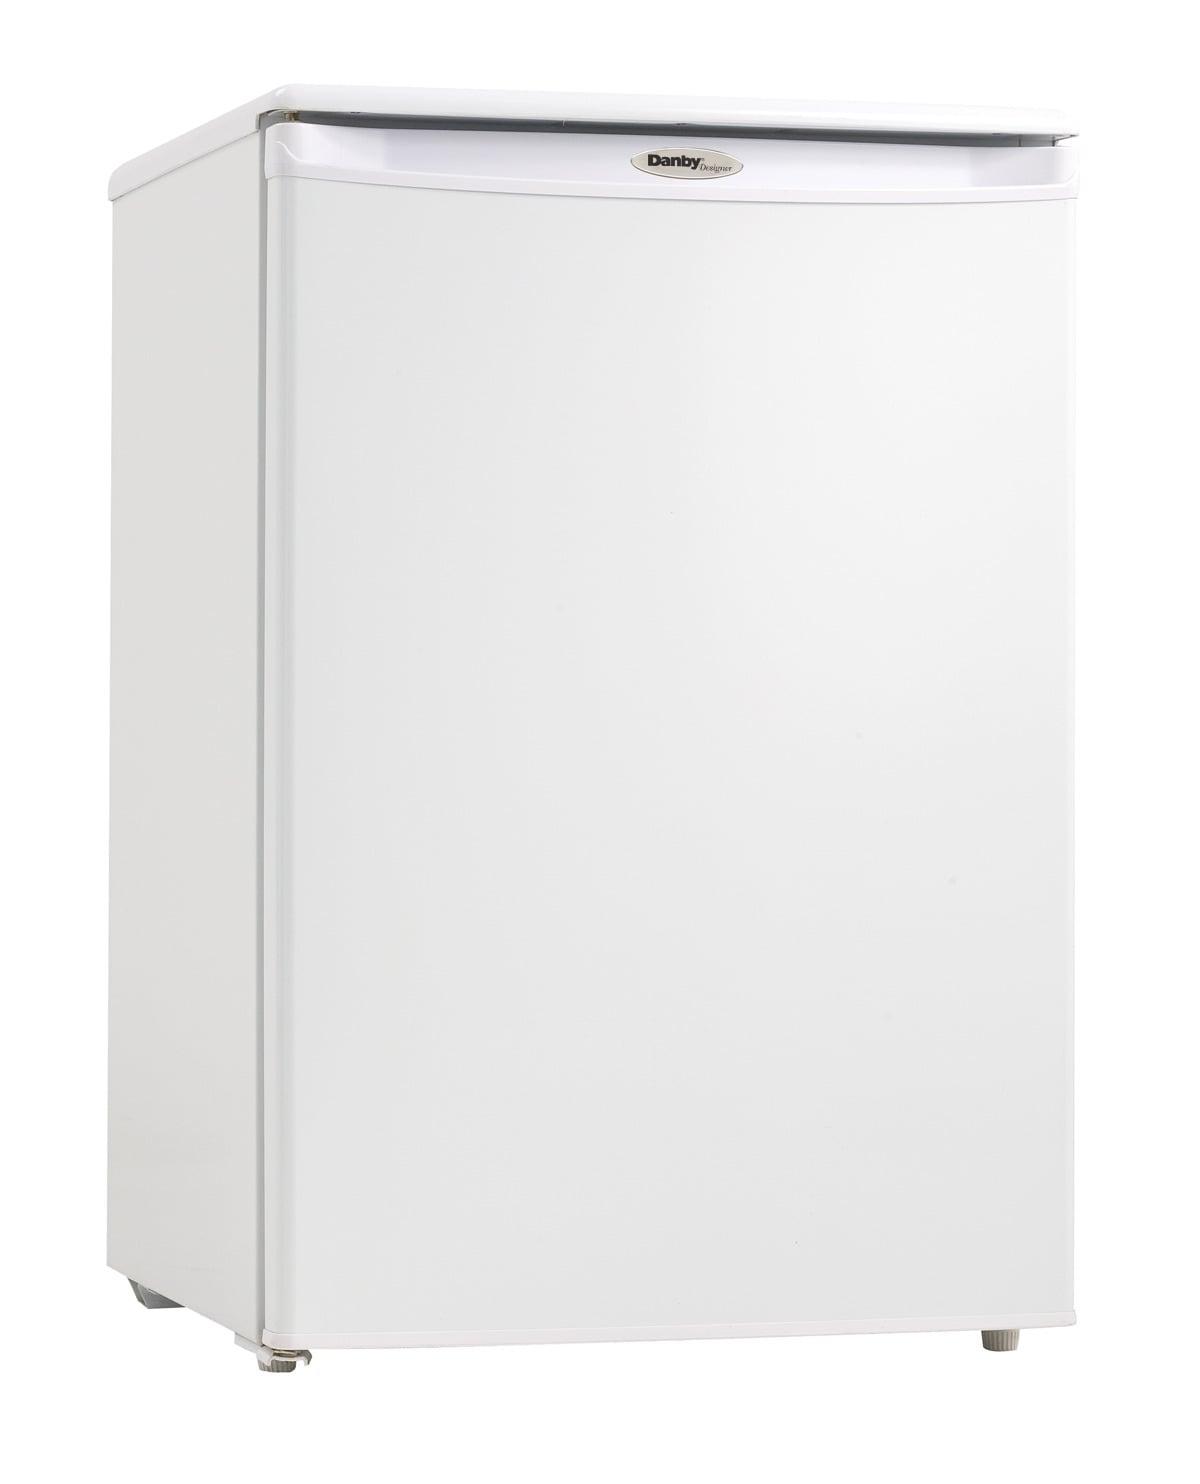 Danby White Upright Freezer (4.3 Cu. Ft.) - DUFM043A1WDD